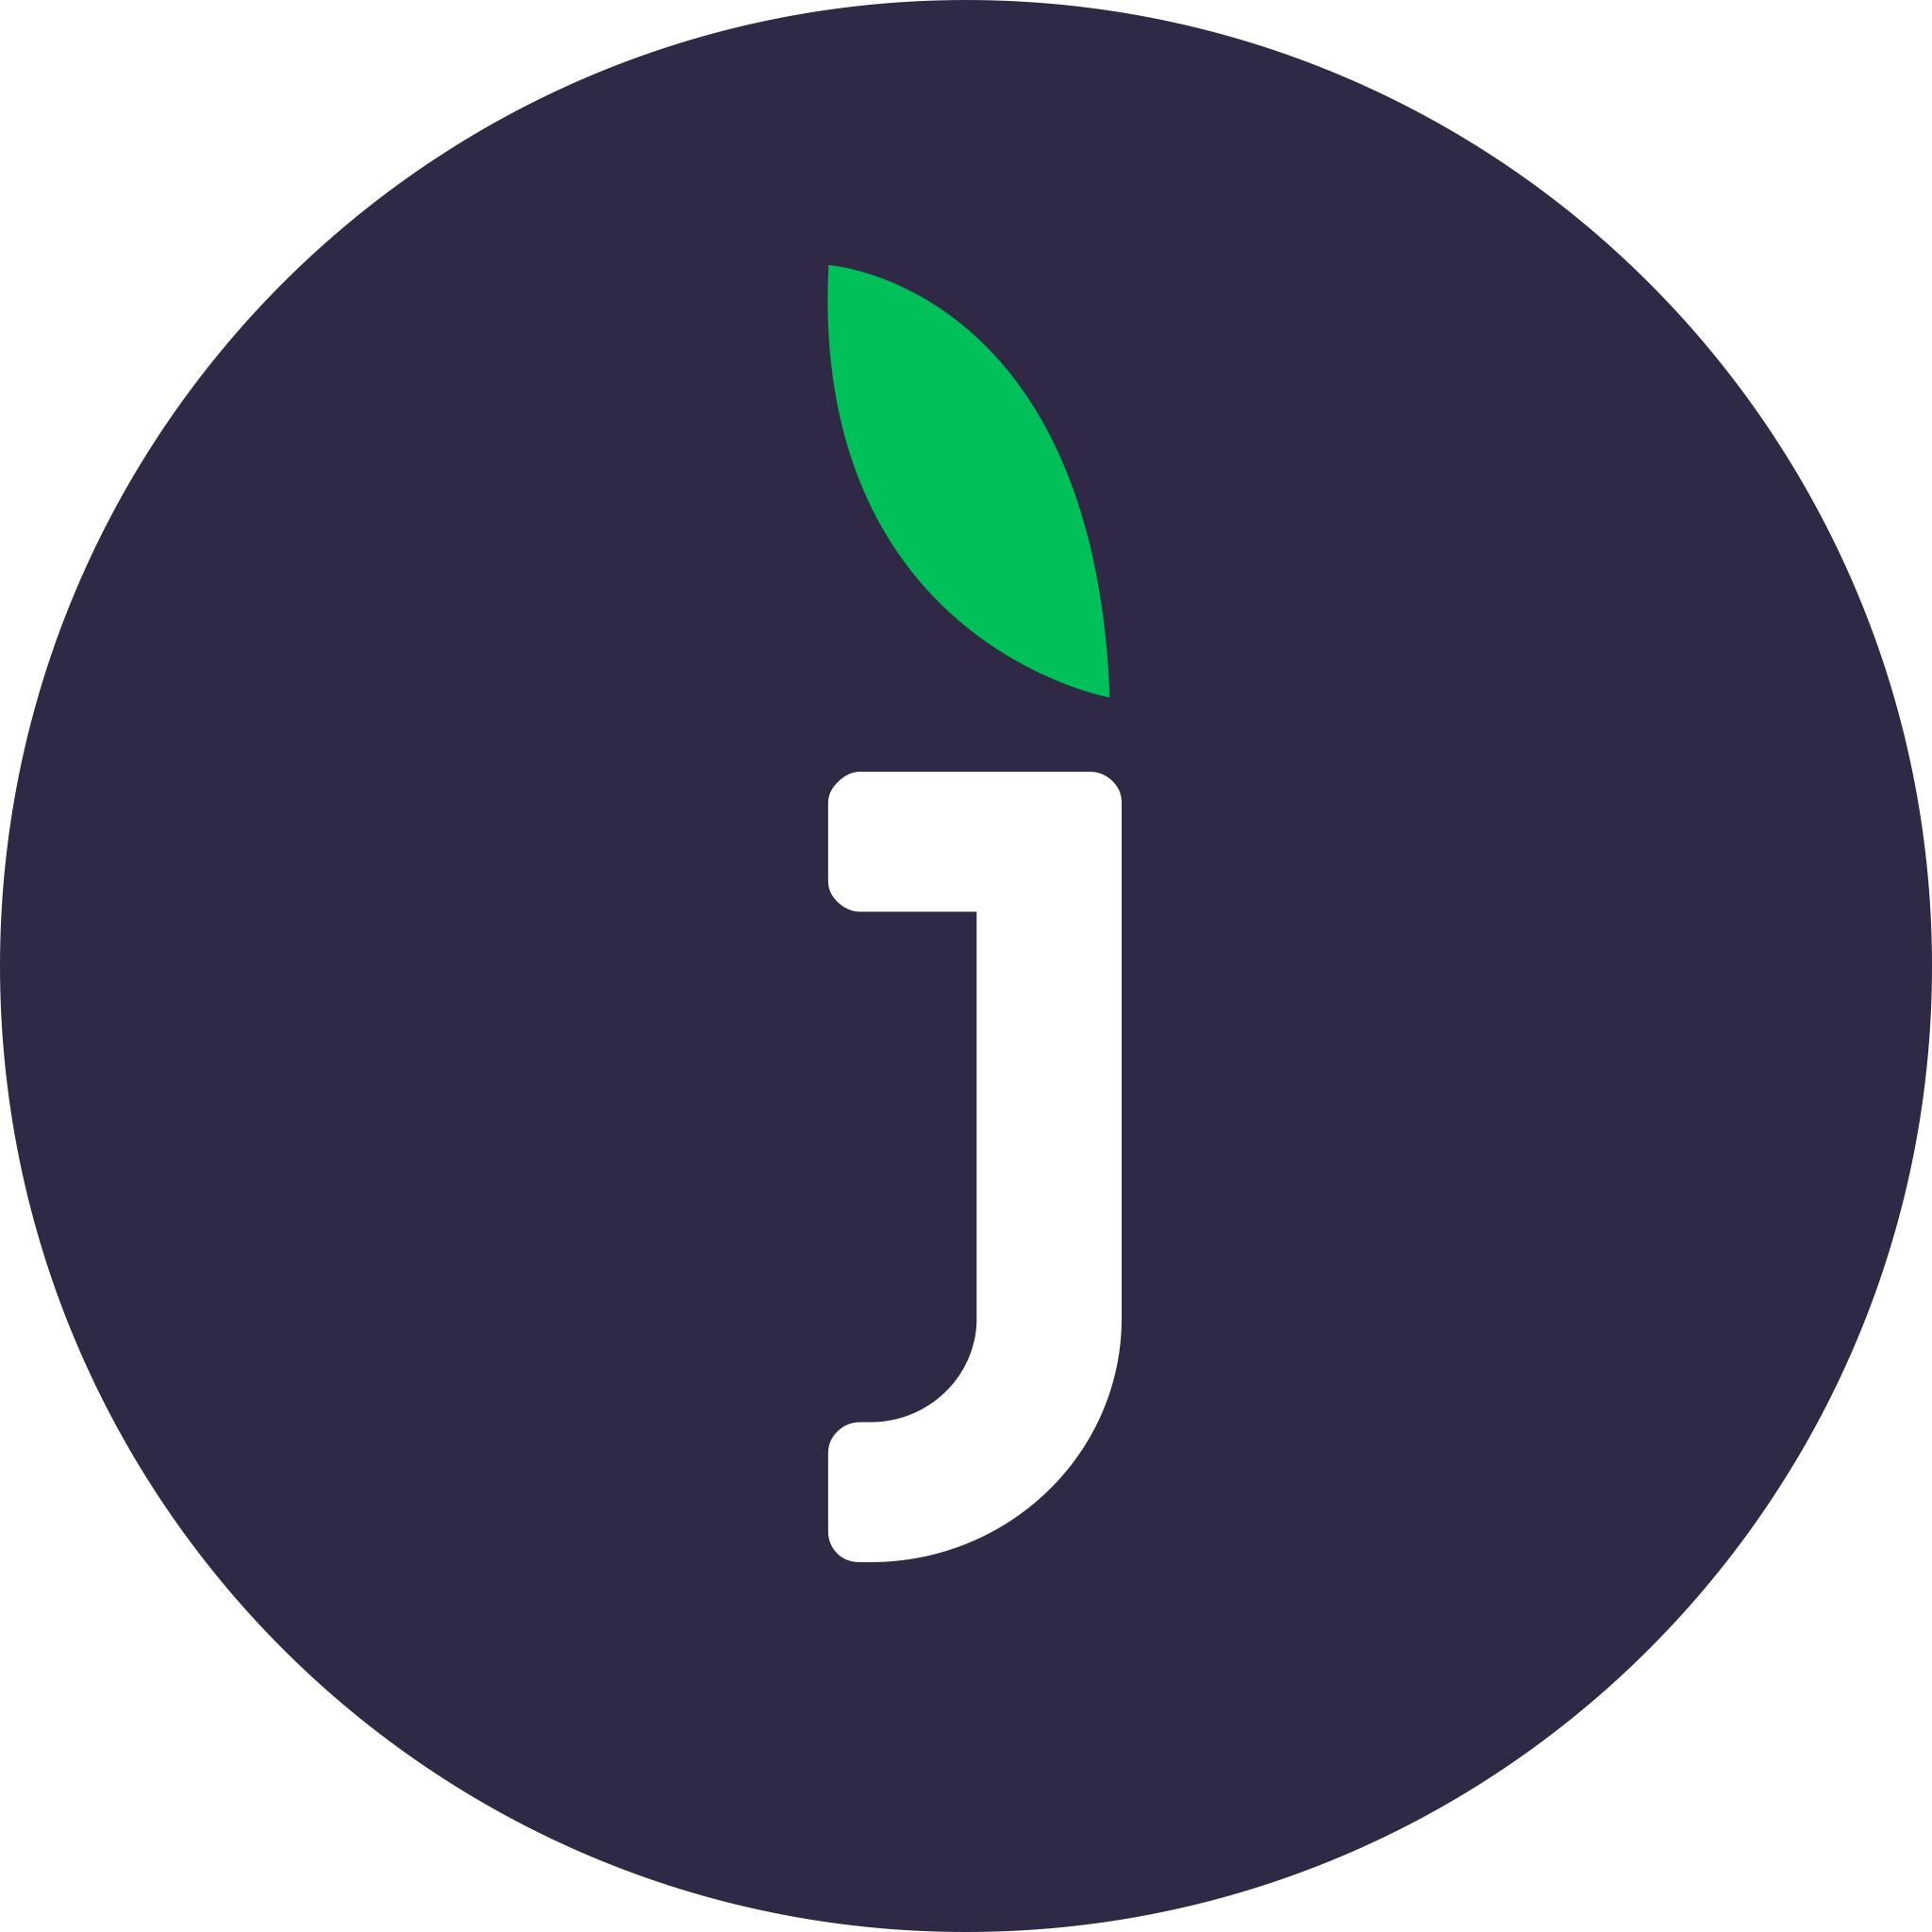 Jivochat logo